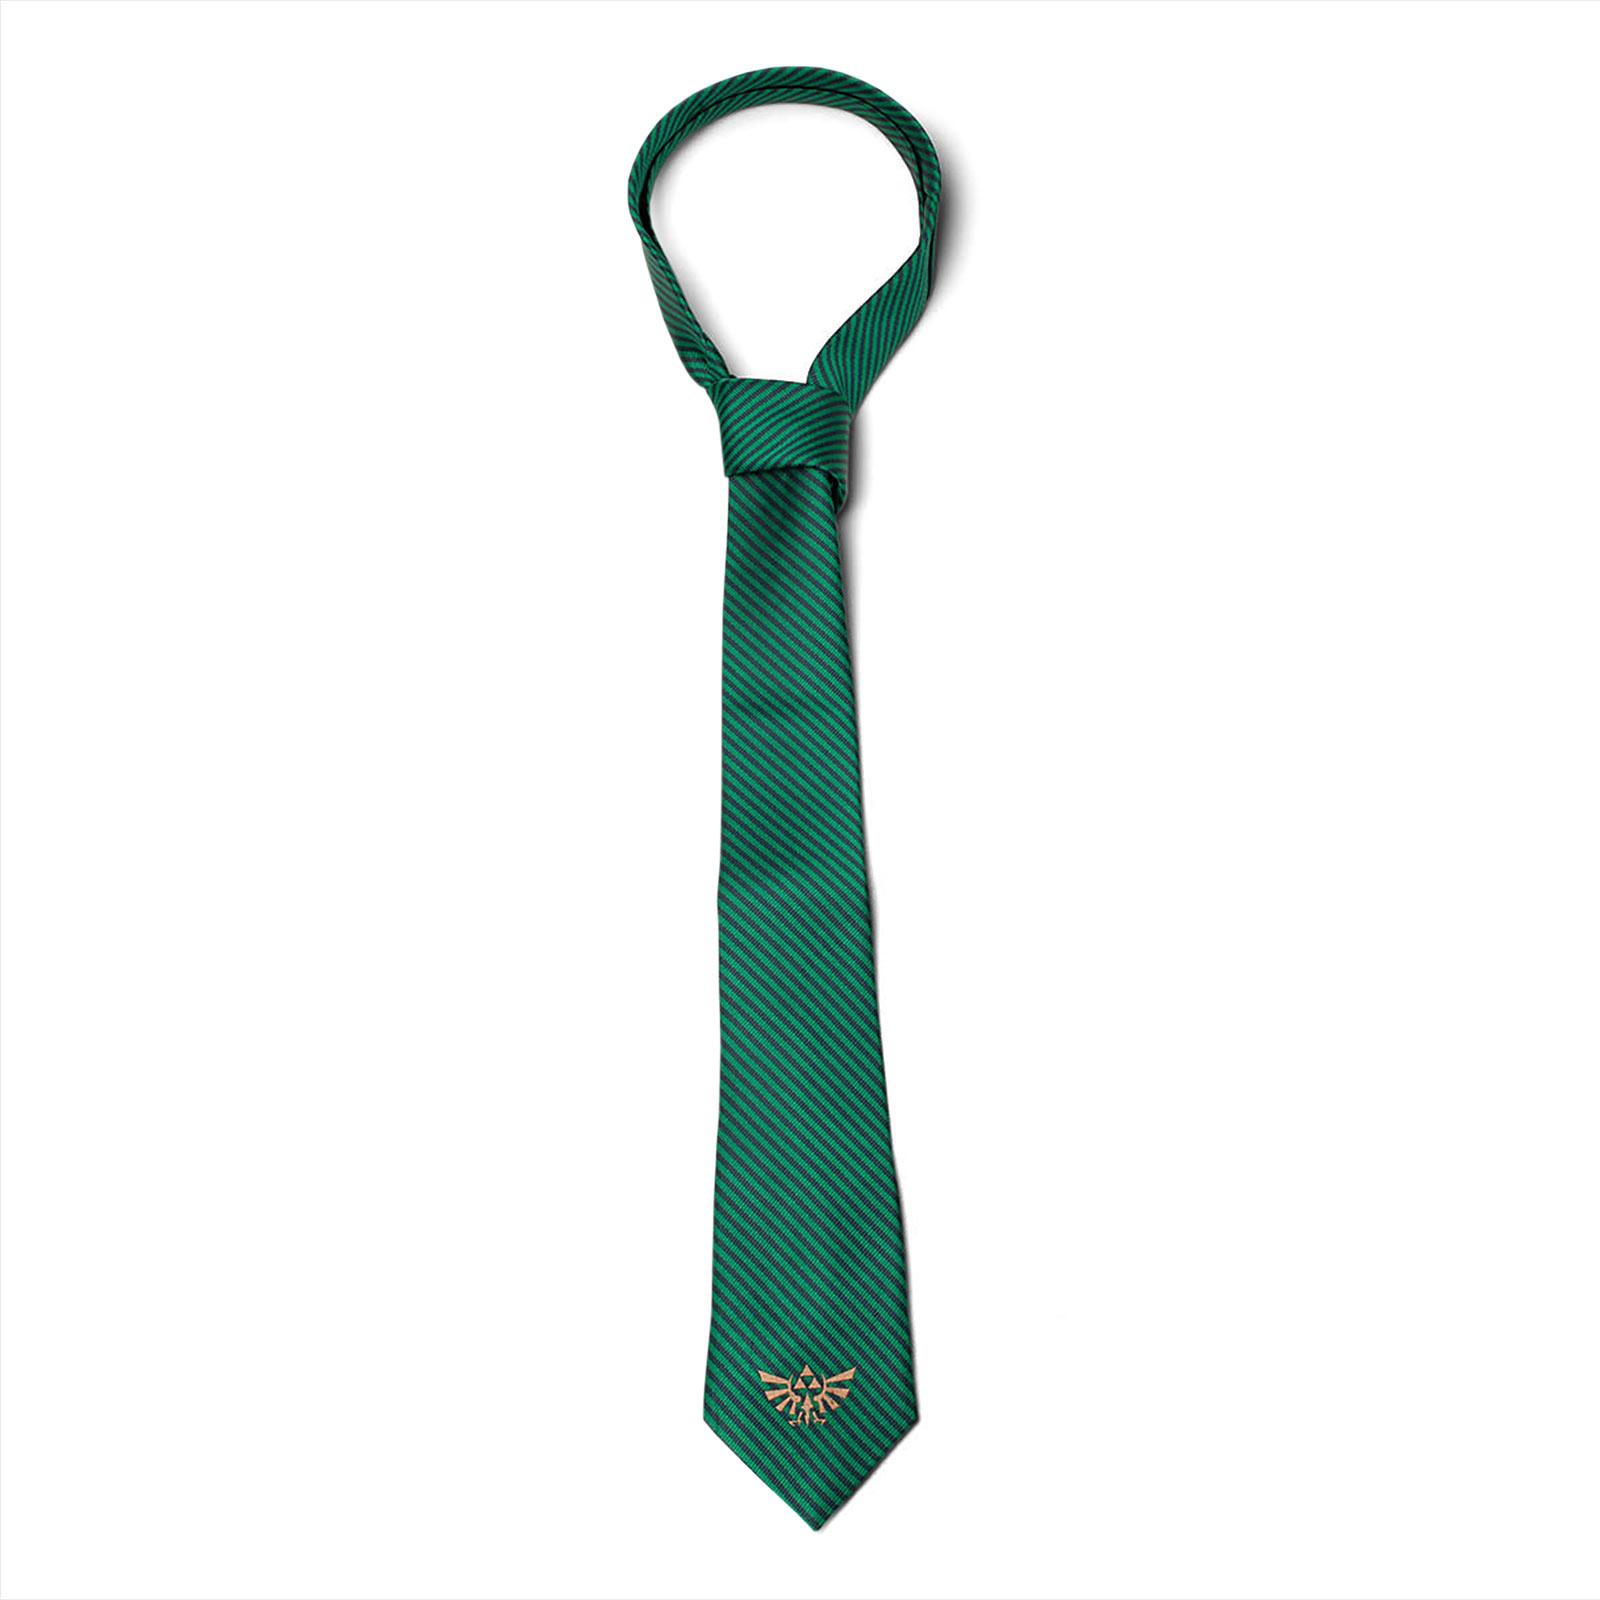 Zelda - Hyrule Logo Krawatte grün